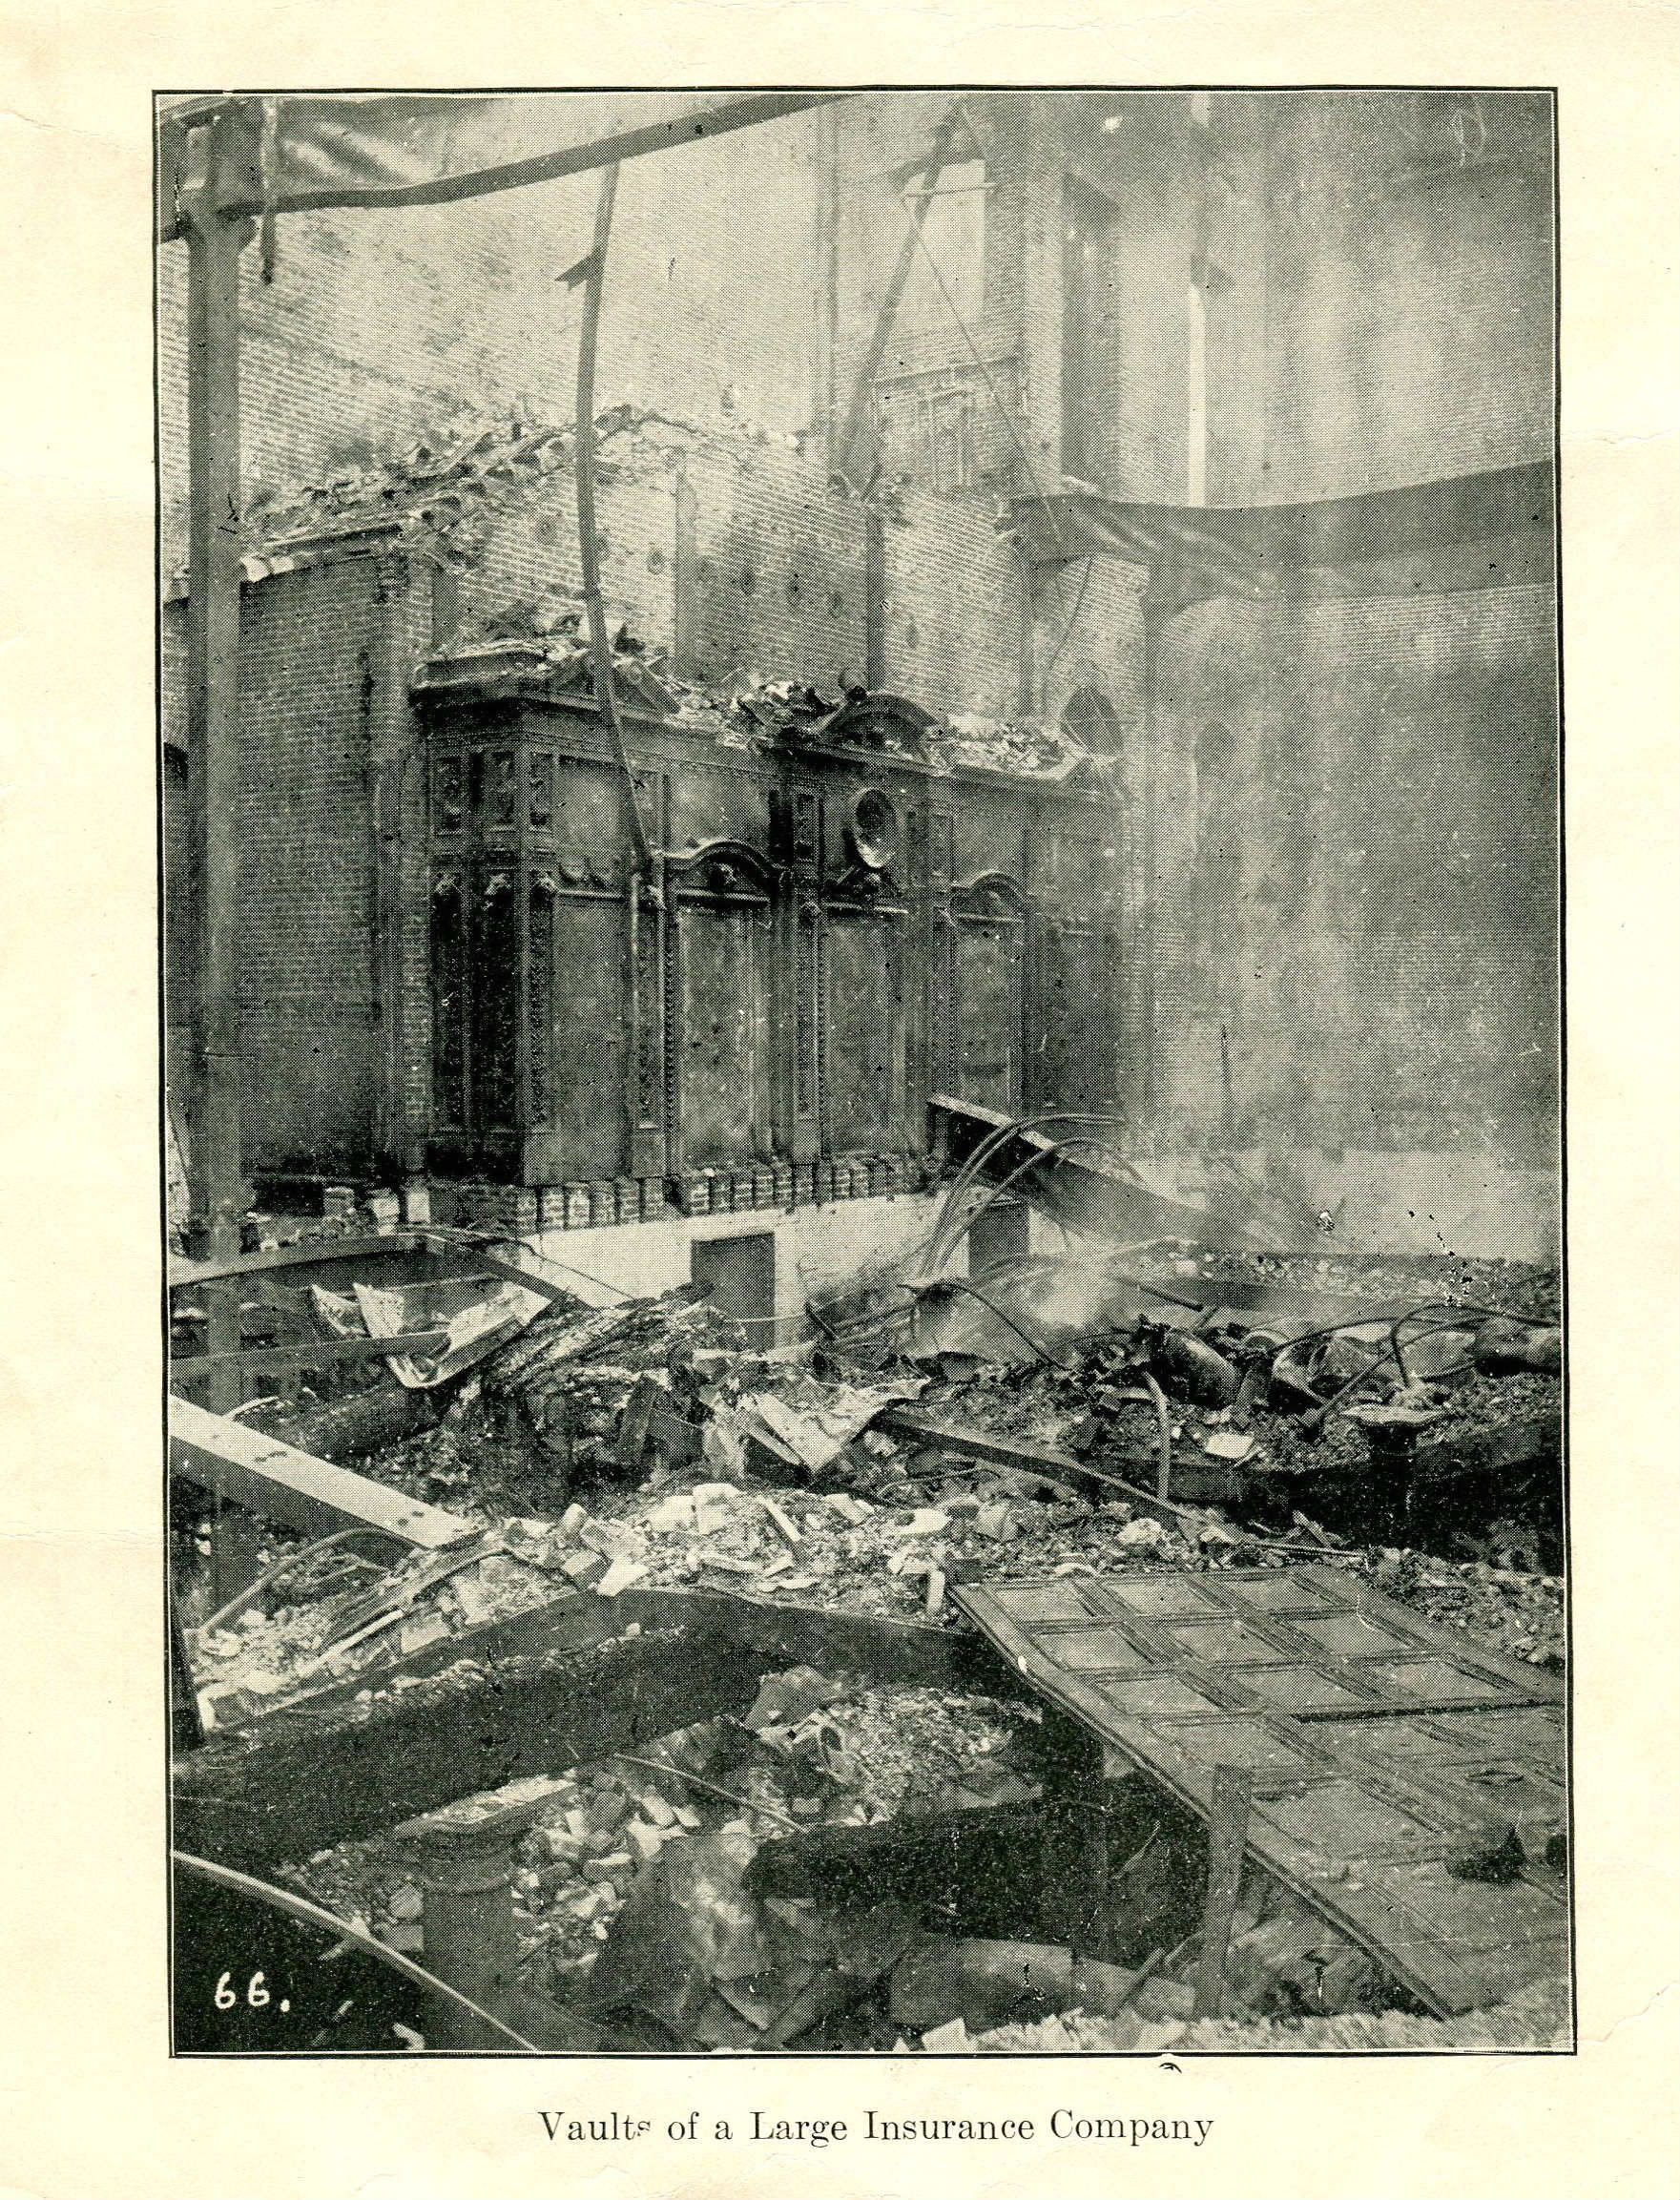 Vaults Of A Large Insurance Company San Francisco Earthquake Of 1906 With Images San Francisco Earthquake Major Earthquakes